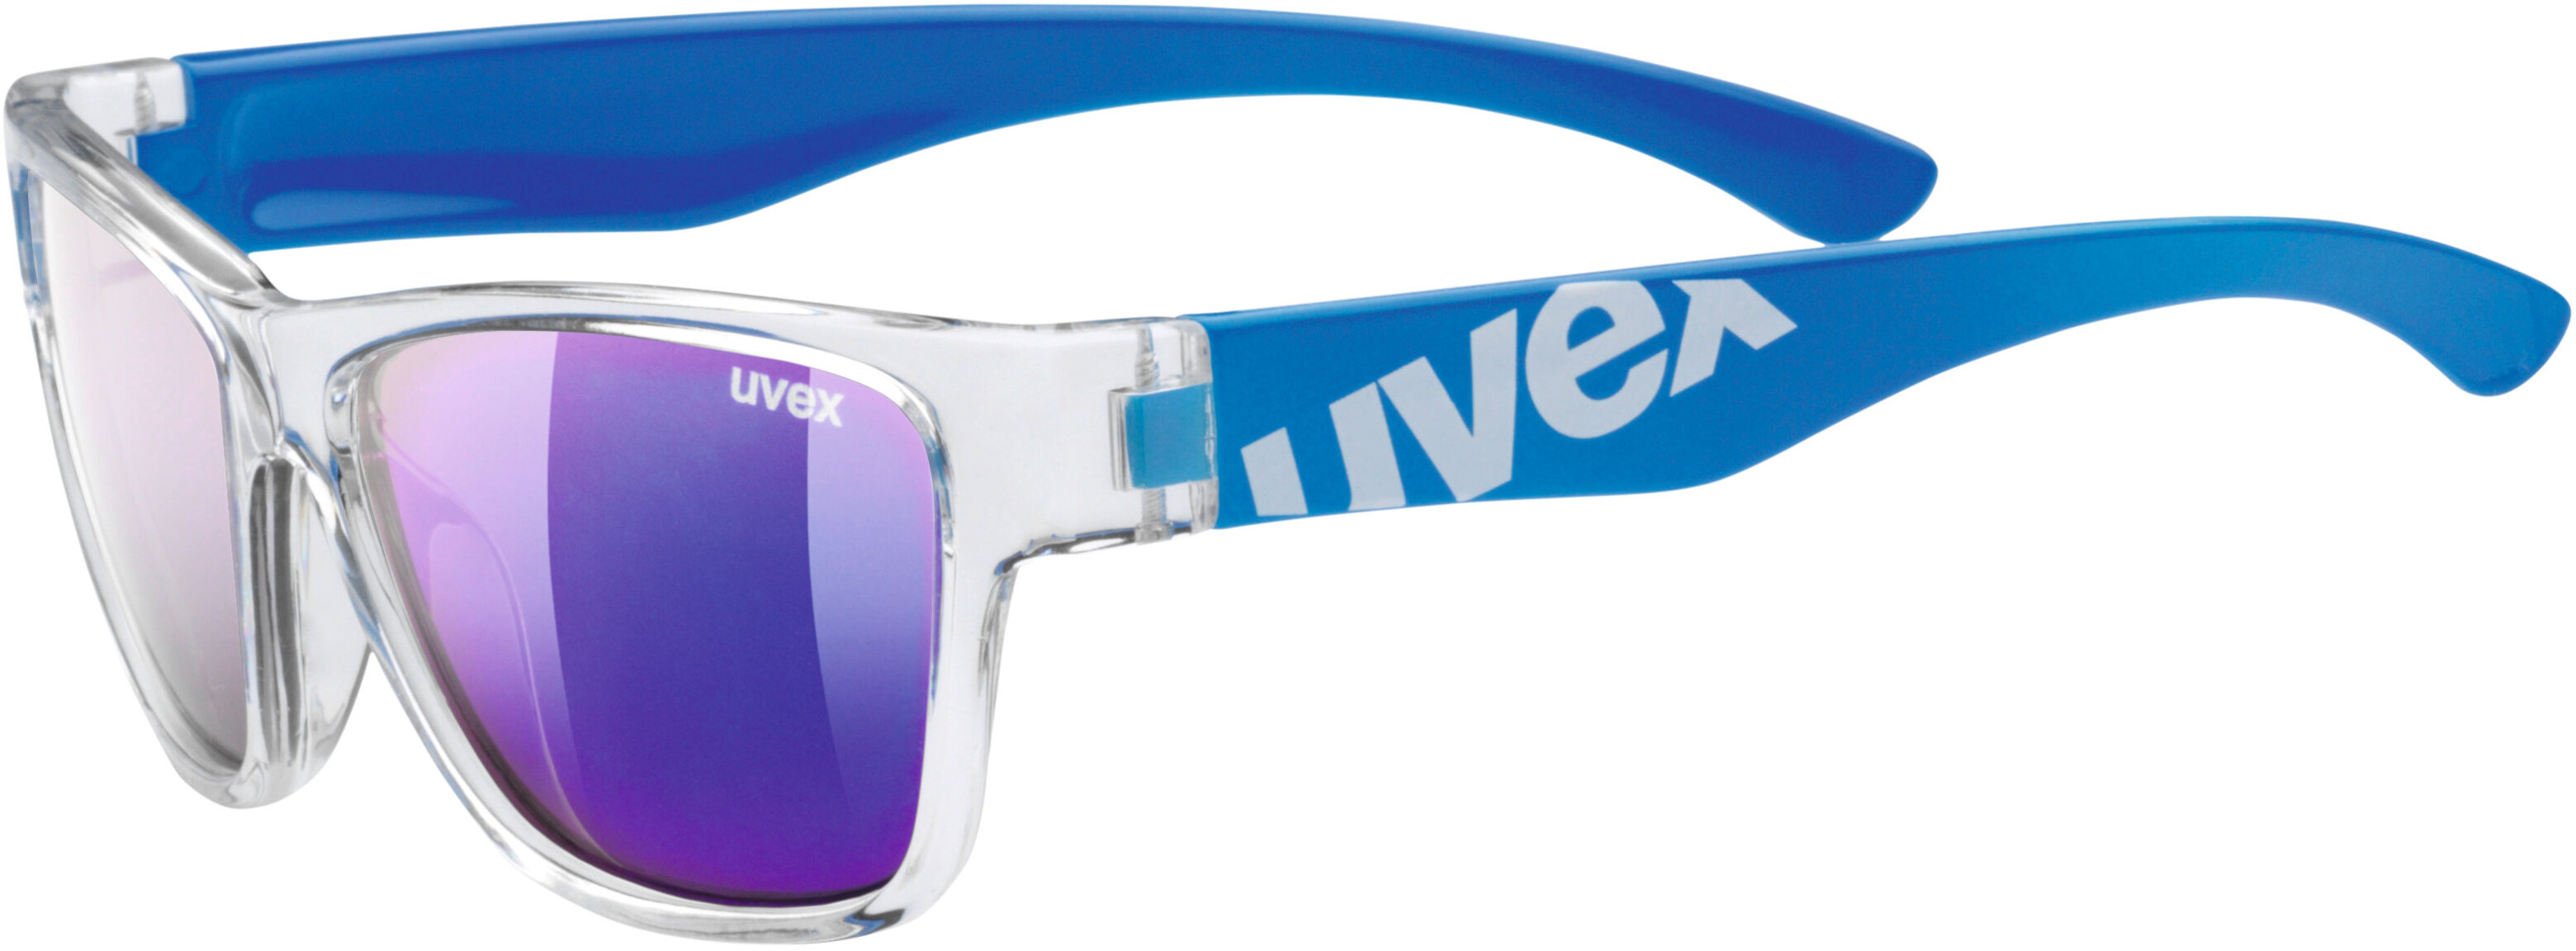 da1d526c0469 UVEX sportstyle 508 Kids Cykelbriller Børn blå